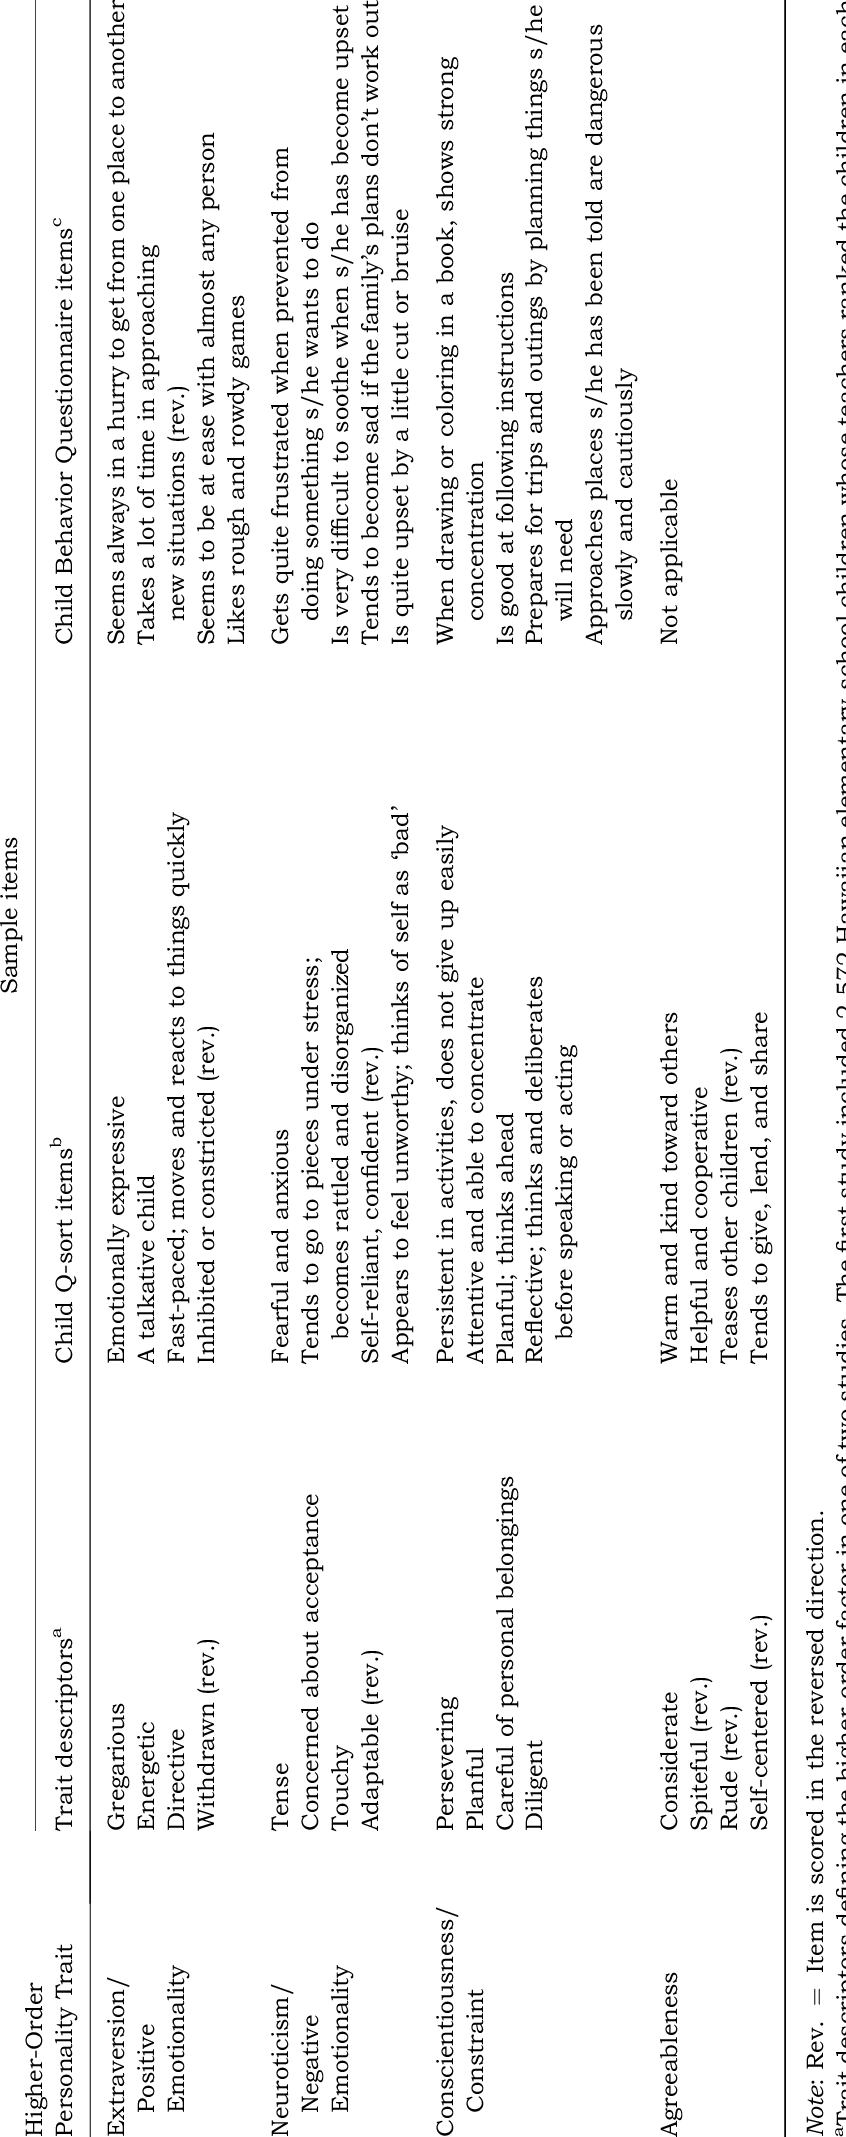 Examples of trait adjectives, California Child Q-sort